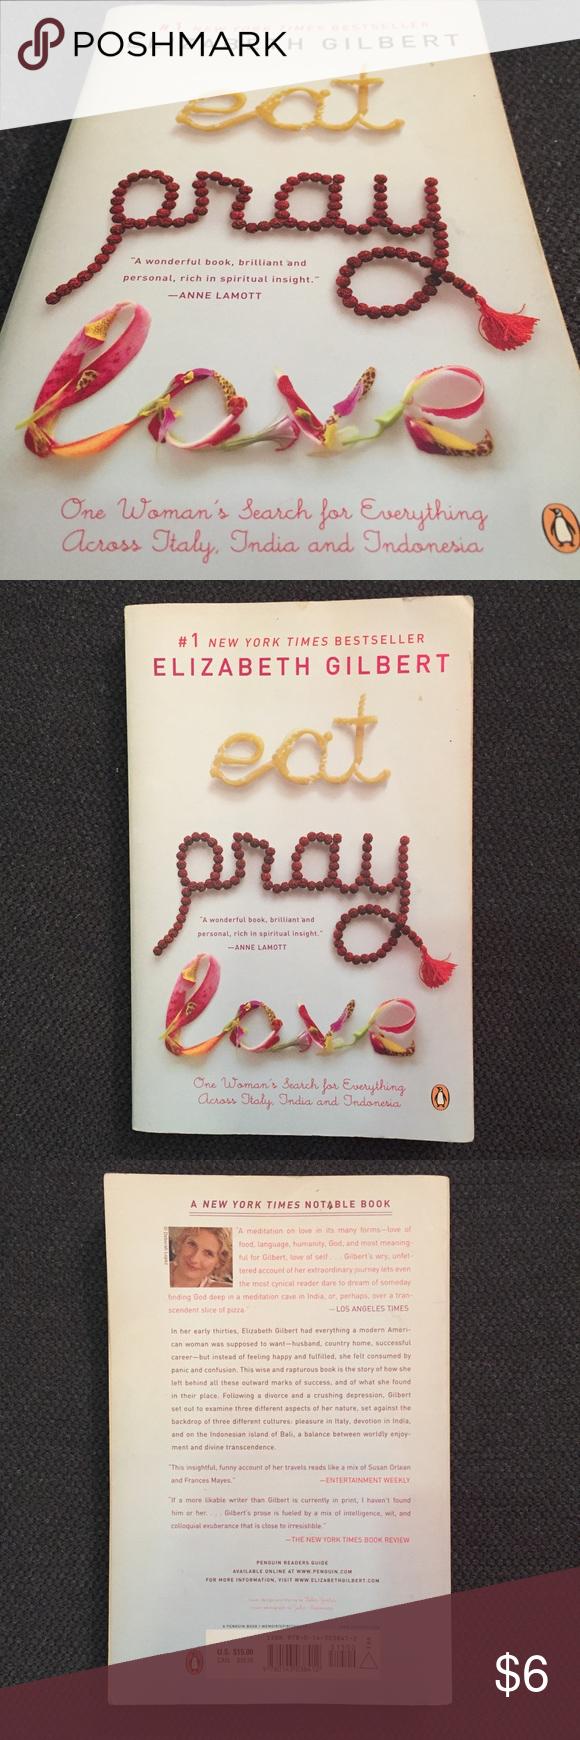 Eat Pray Love Book By Author Elizabeth Gilbert In 2020 Eat Pray Love Book Elizabeth Gilbert Love Book